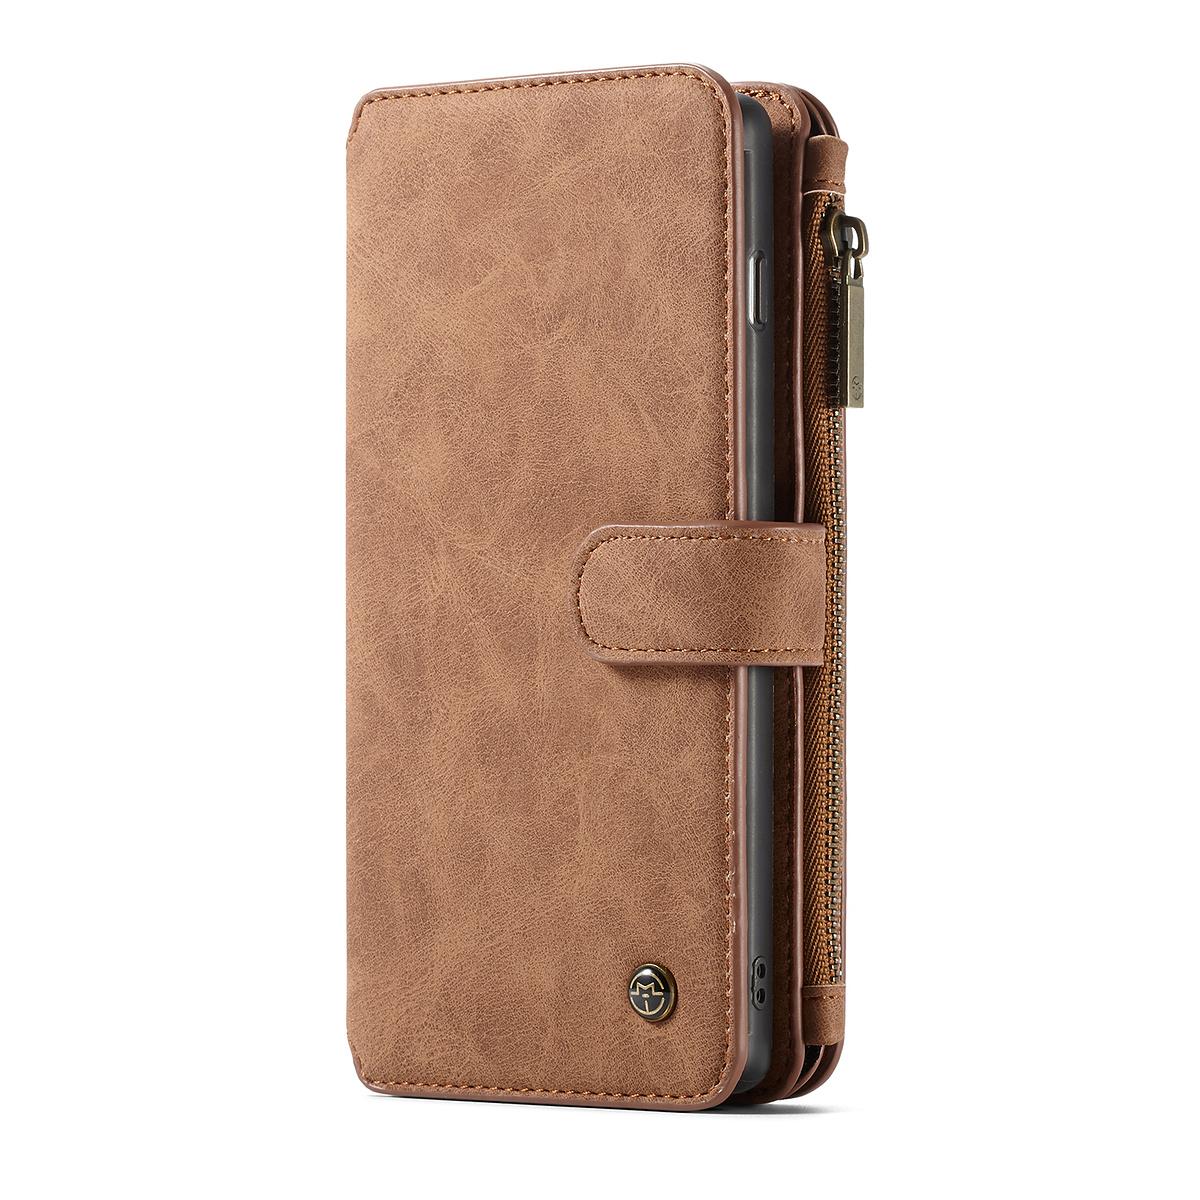 CaseMe plånboksfodral magnetskal, Samsung Galaxy S10 Plus, brun